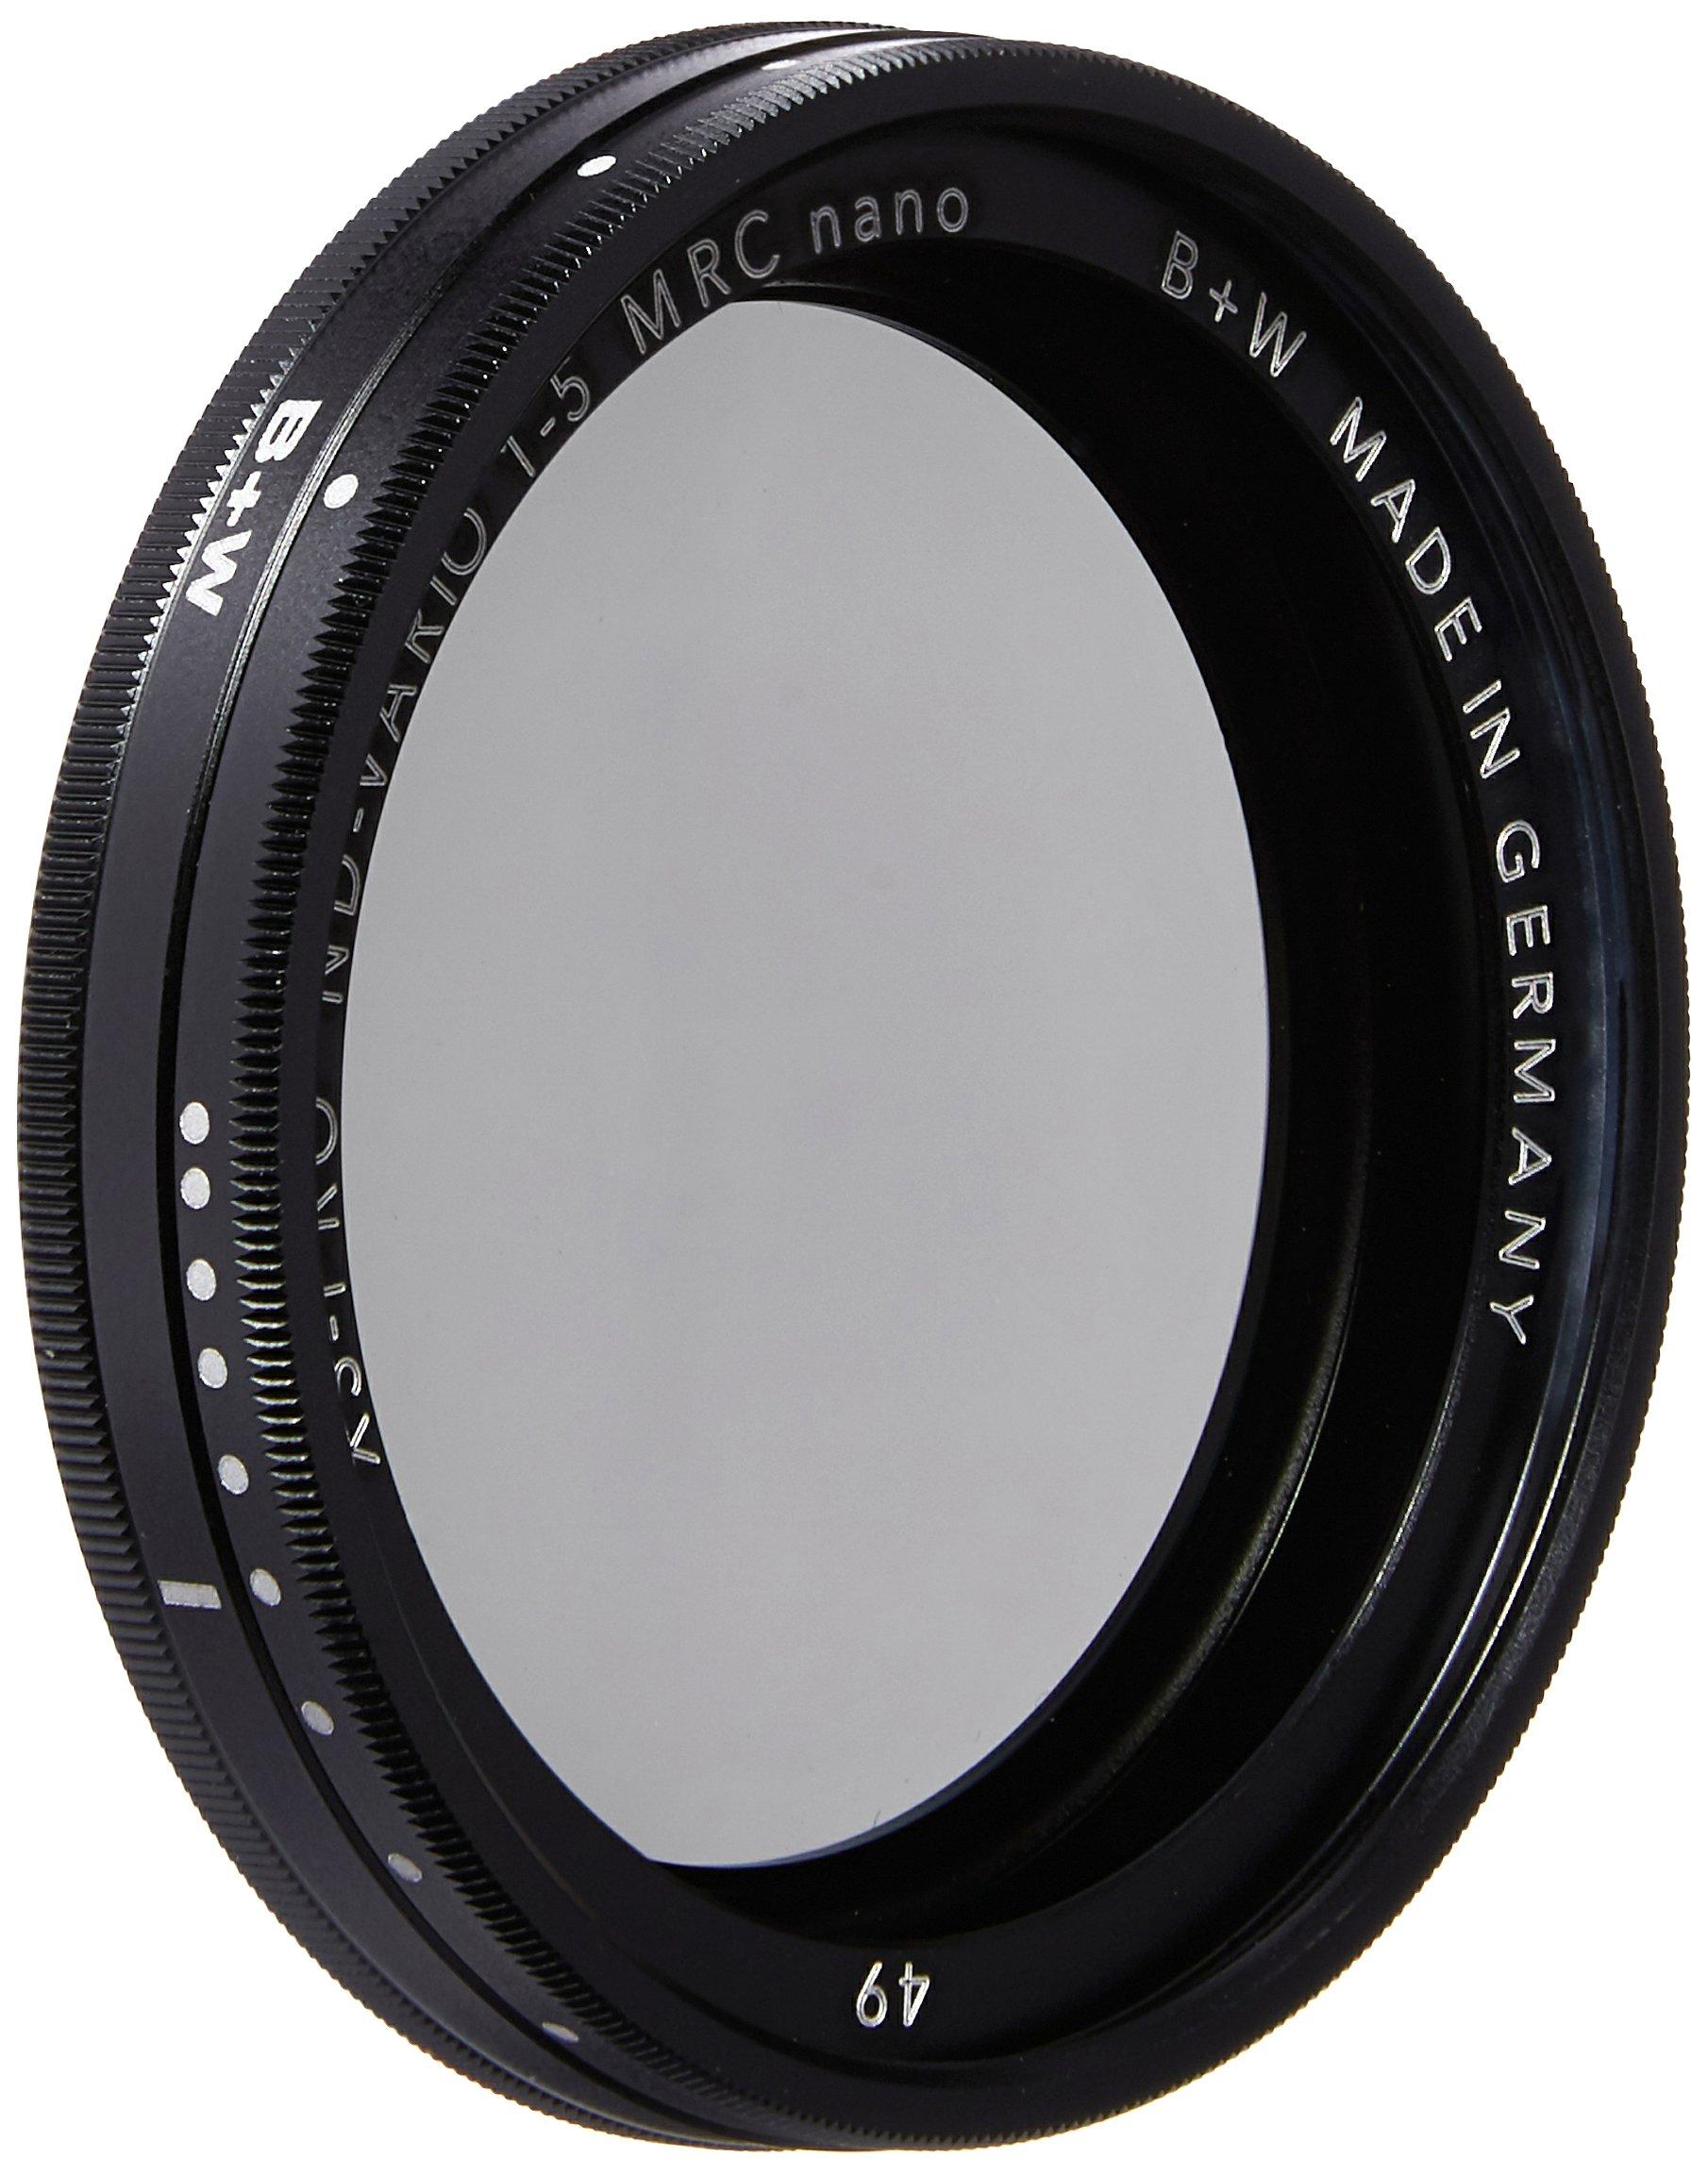 B+W 49mm XS-Pro Digital Vario ND with Multi-Resistant Nano Coating by Schneider Optics